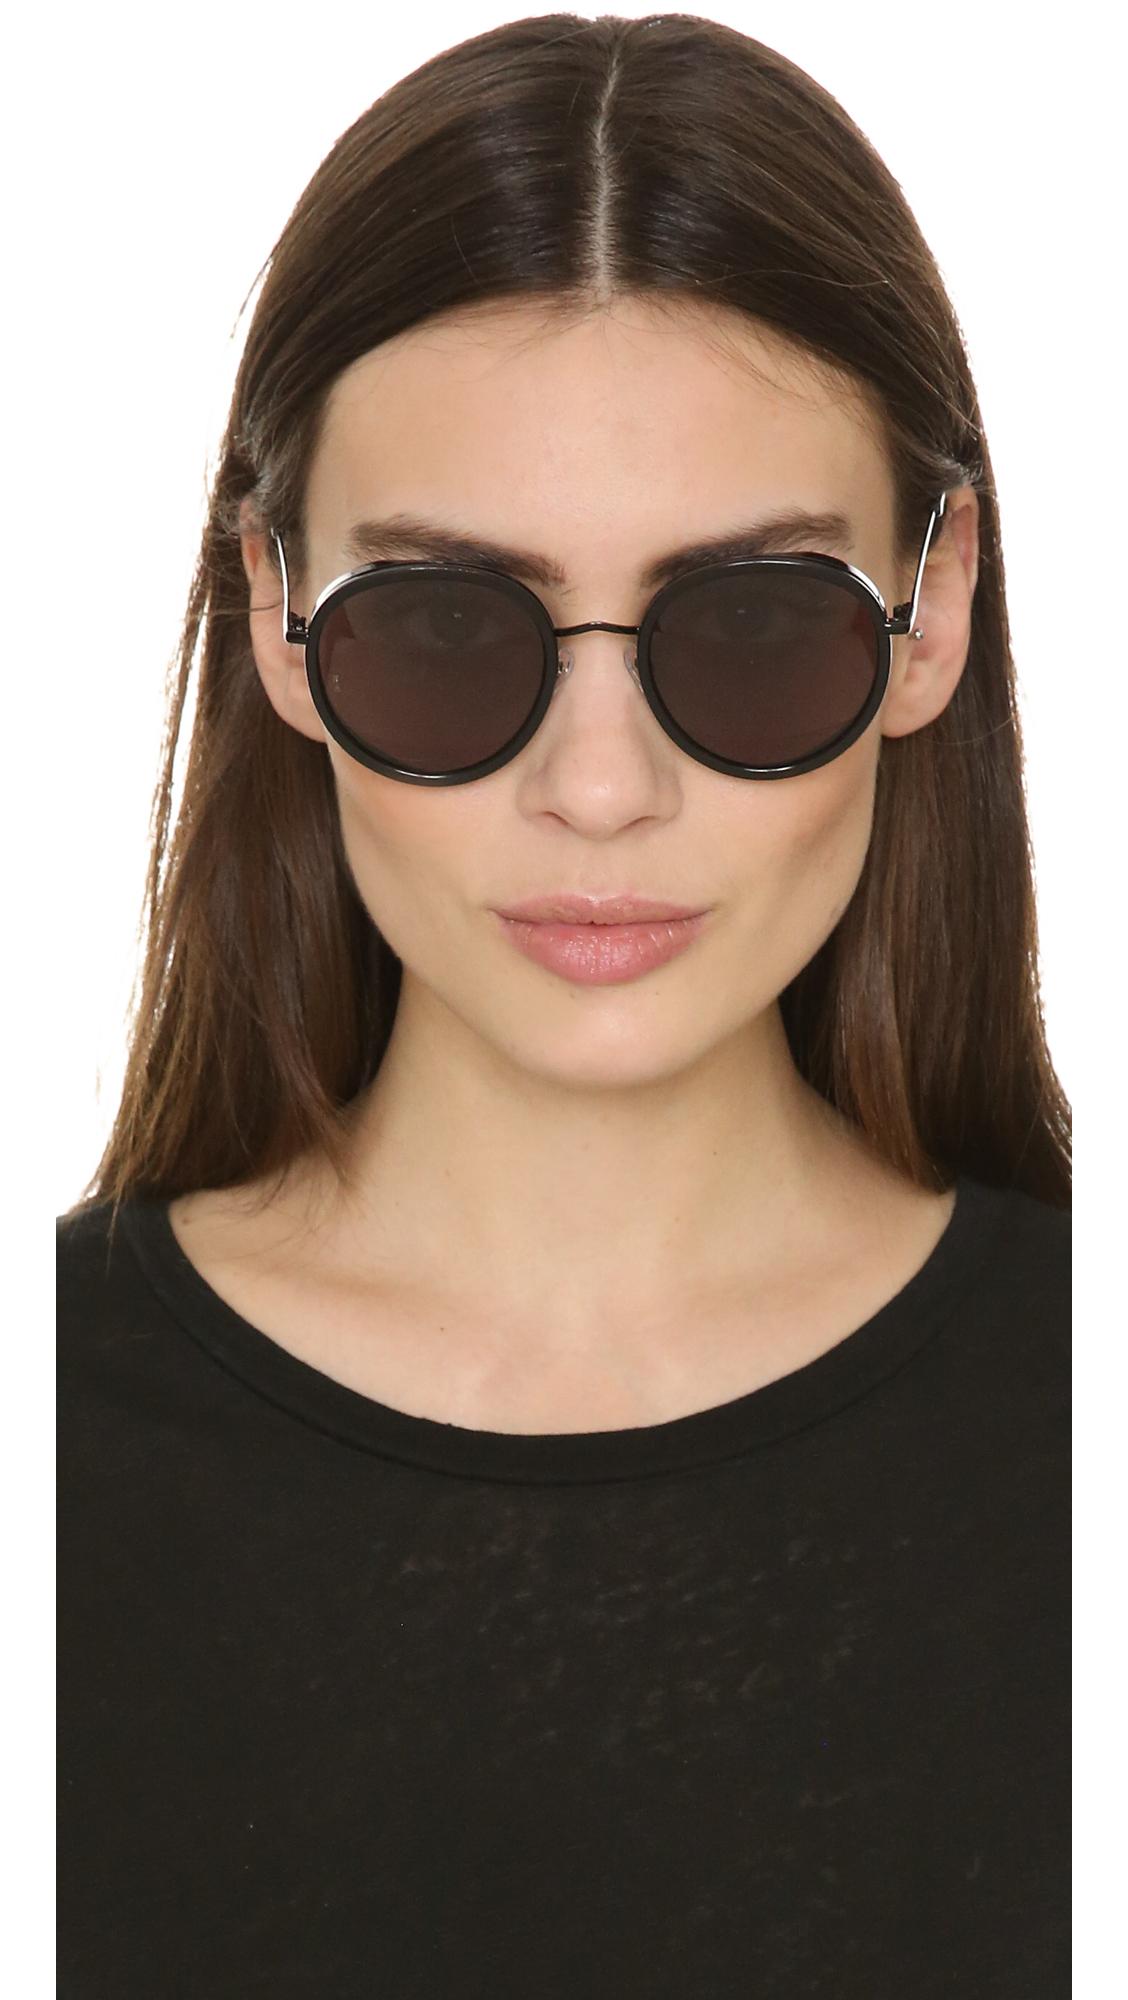 b4e1f795d20 Wonderland Montclair Sunglasses